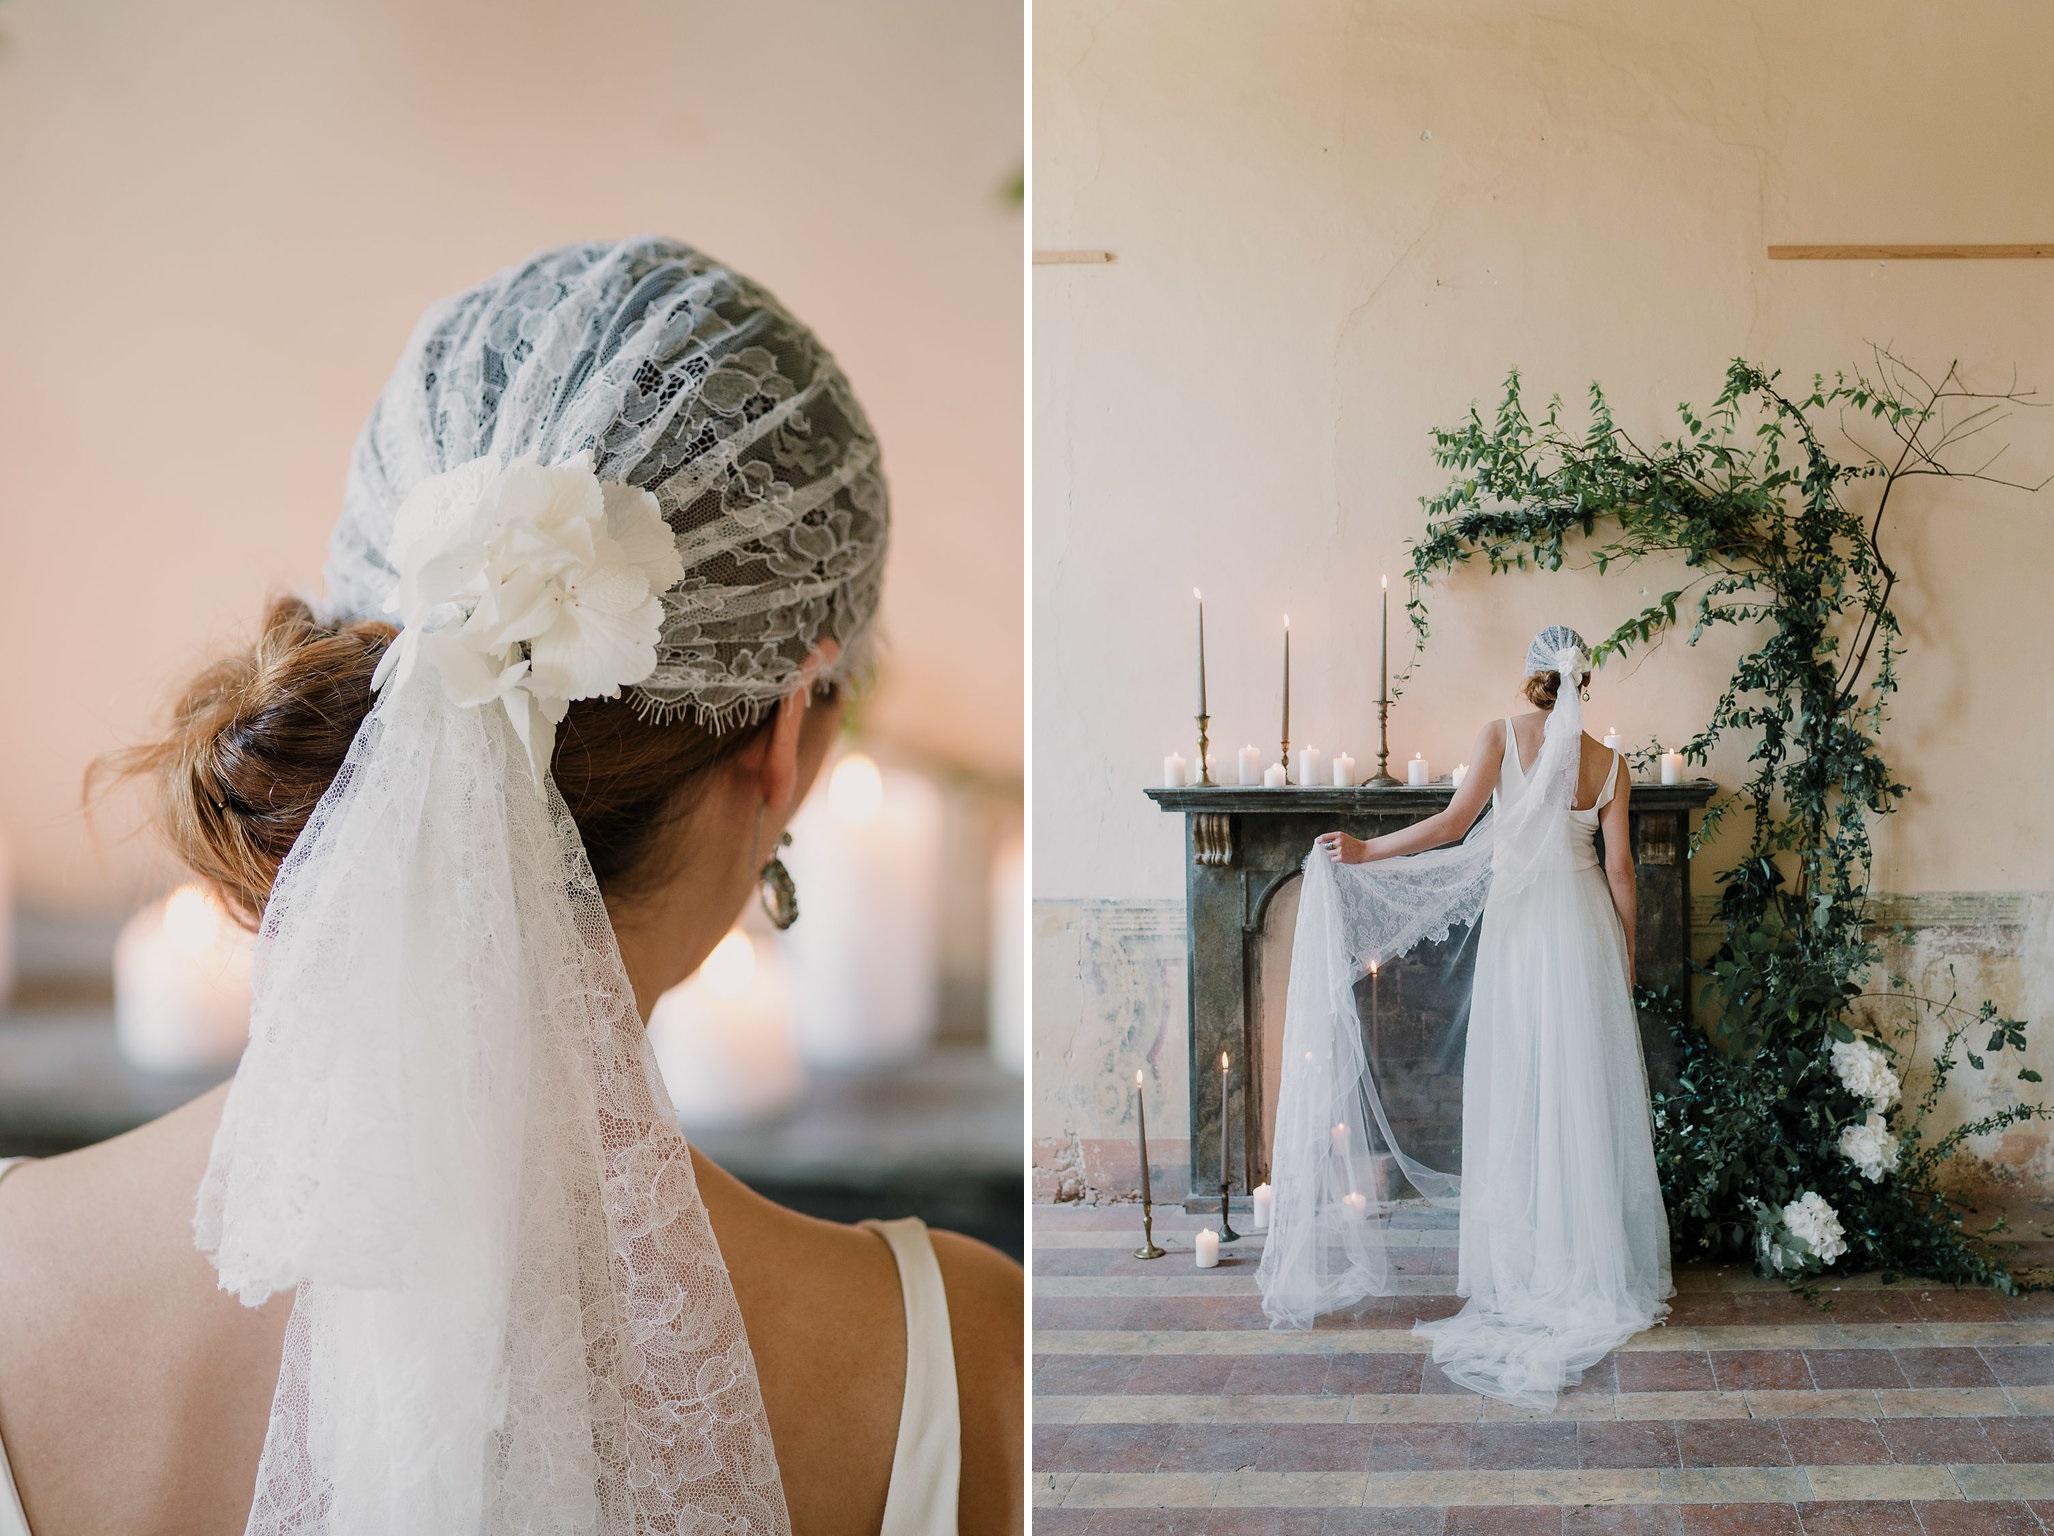 Lace Cap Bridal Veil